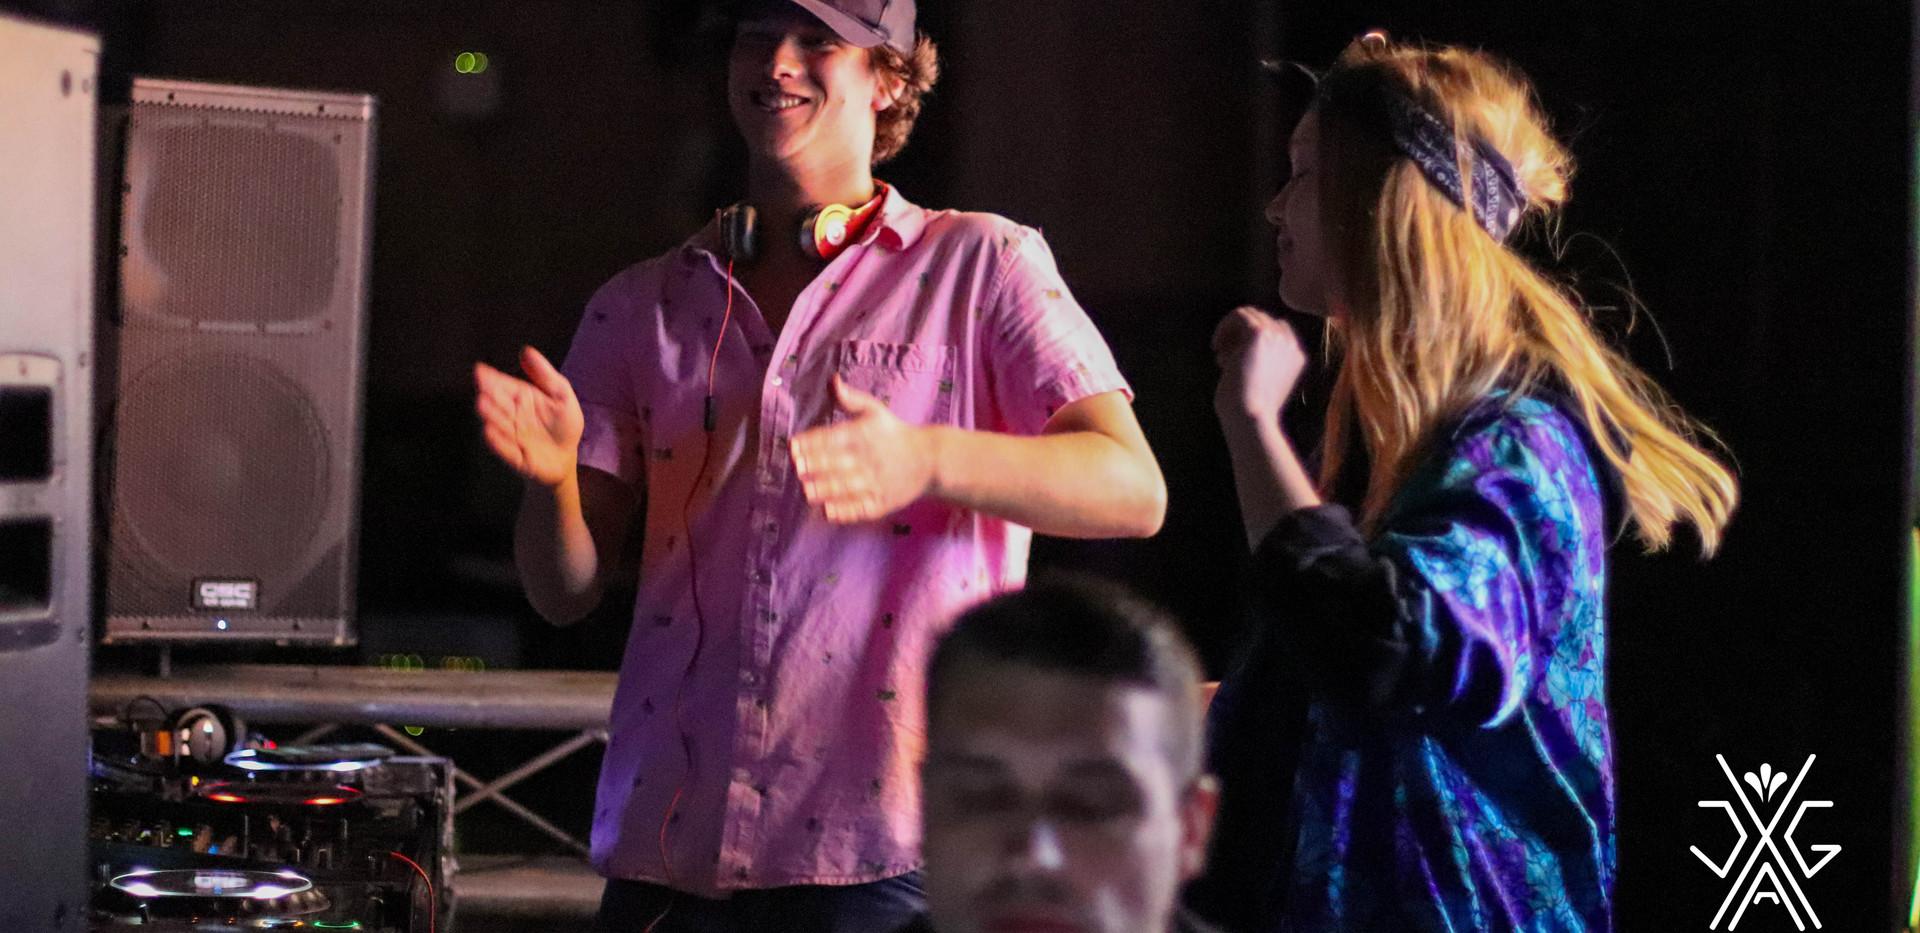 DJ ABS - #partydujag édition halloween